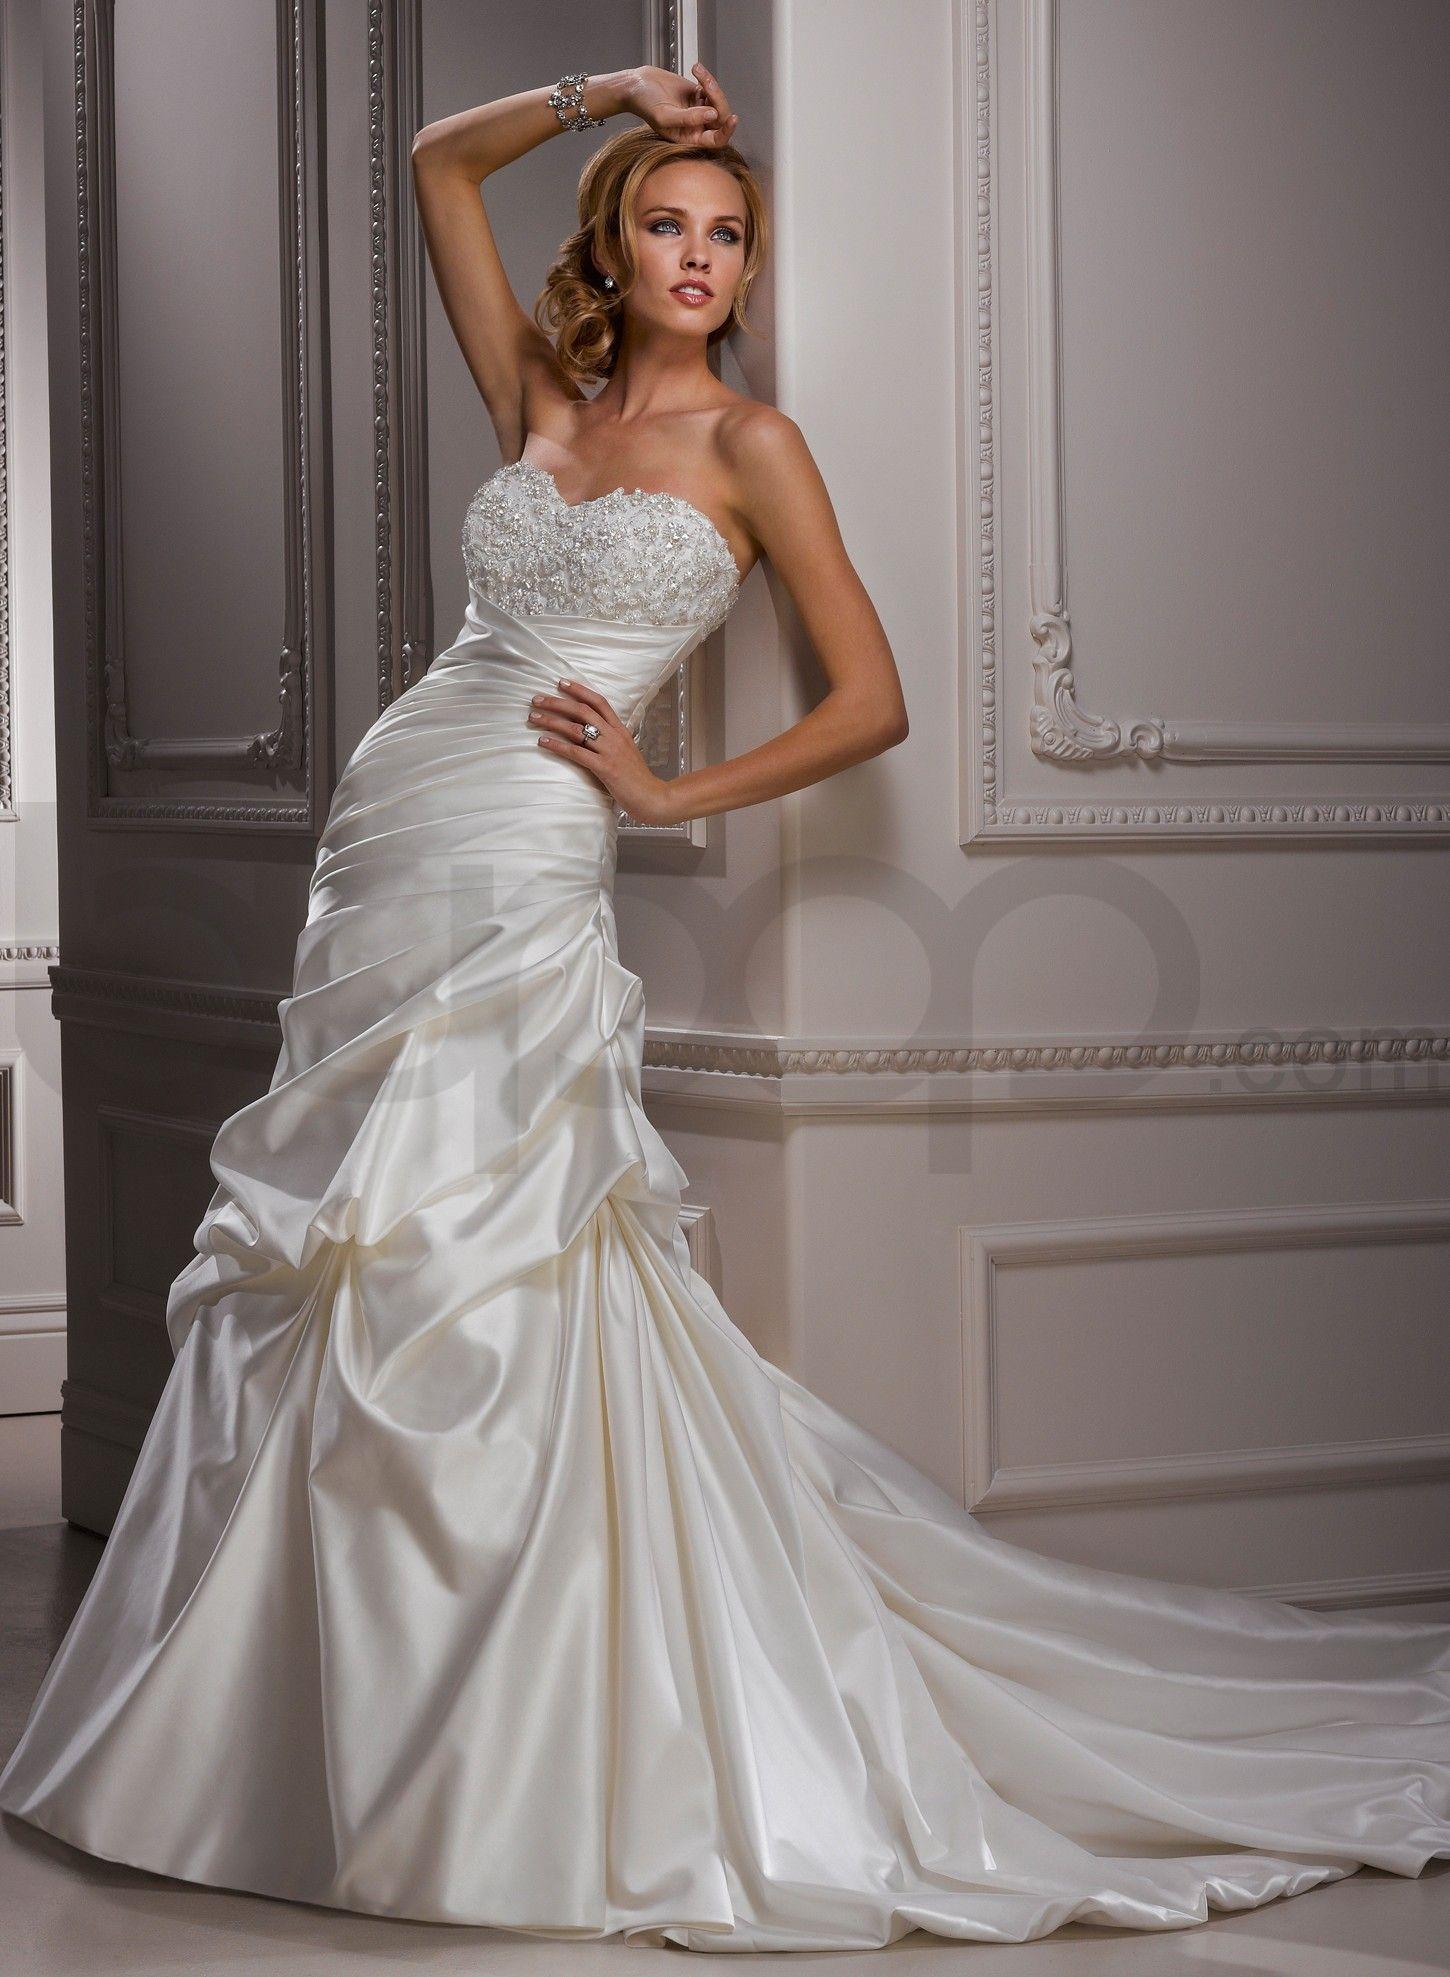 Rushing Sweetheart Neck Line Wedding Dresses